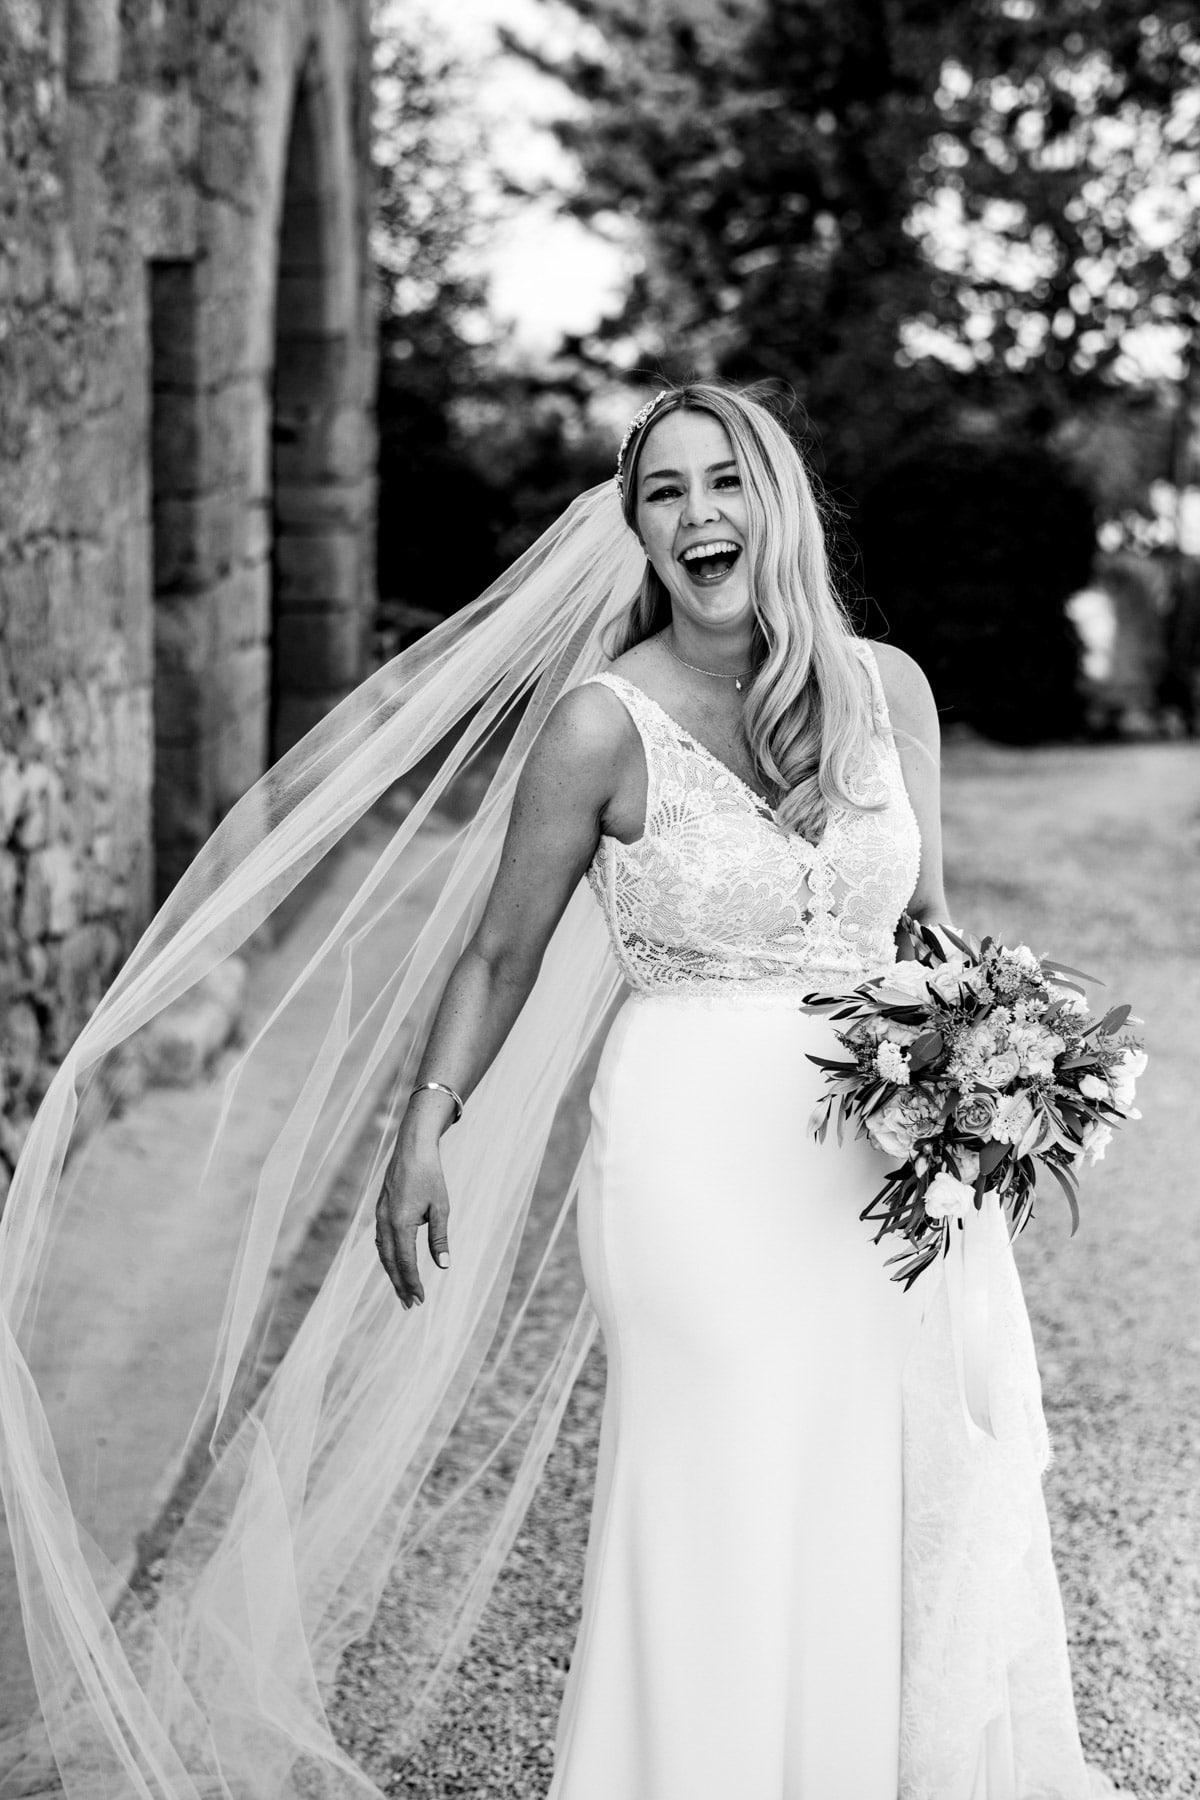 03Best documentary wedding photos